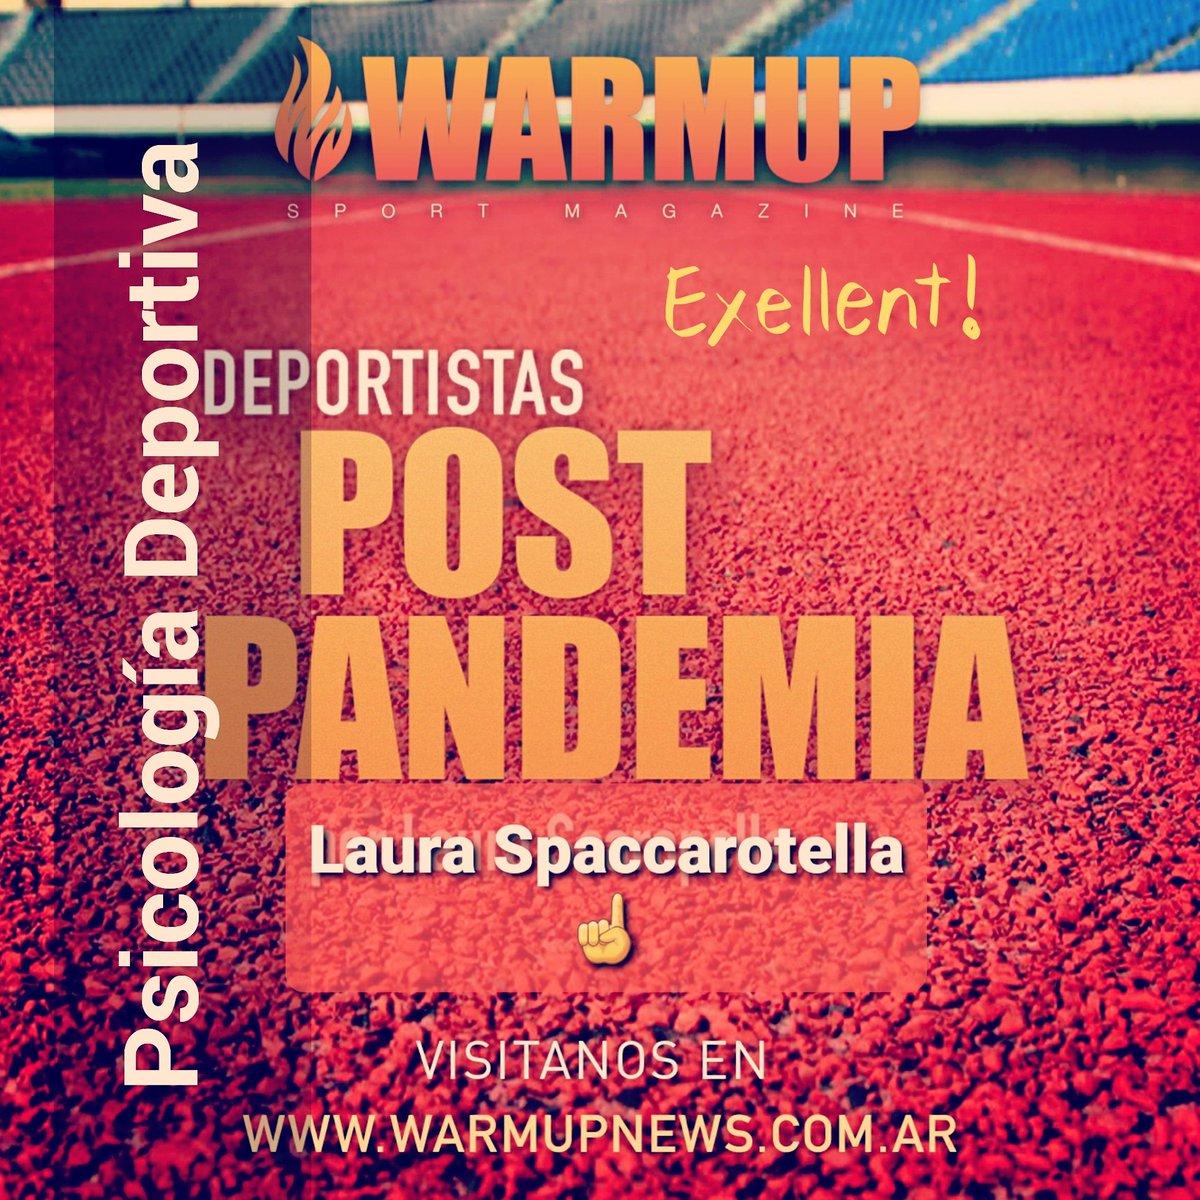 📢 notón de #PsicologíaDeportiva  @LSpaccarotella  #FUNADEP #WARMUP  ▶️ https://t.co/arpM2nAELm https://t.co/YoB0I7nEGF